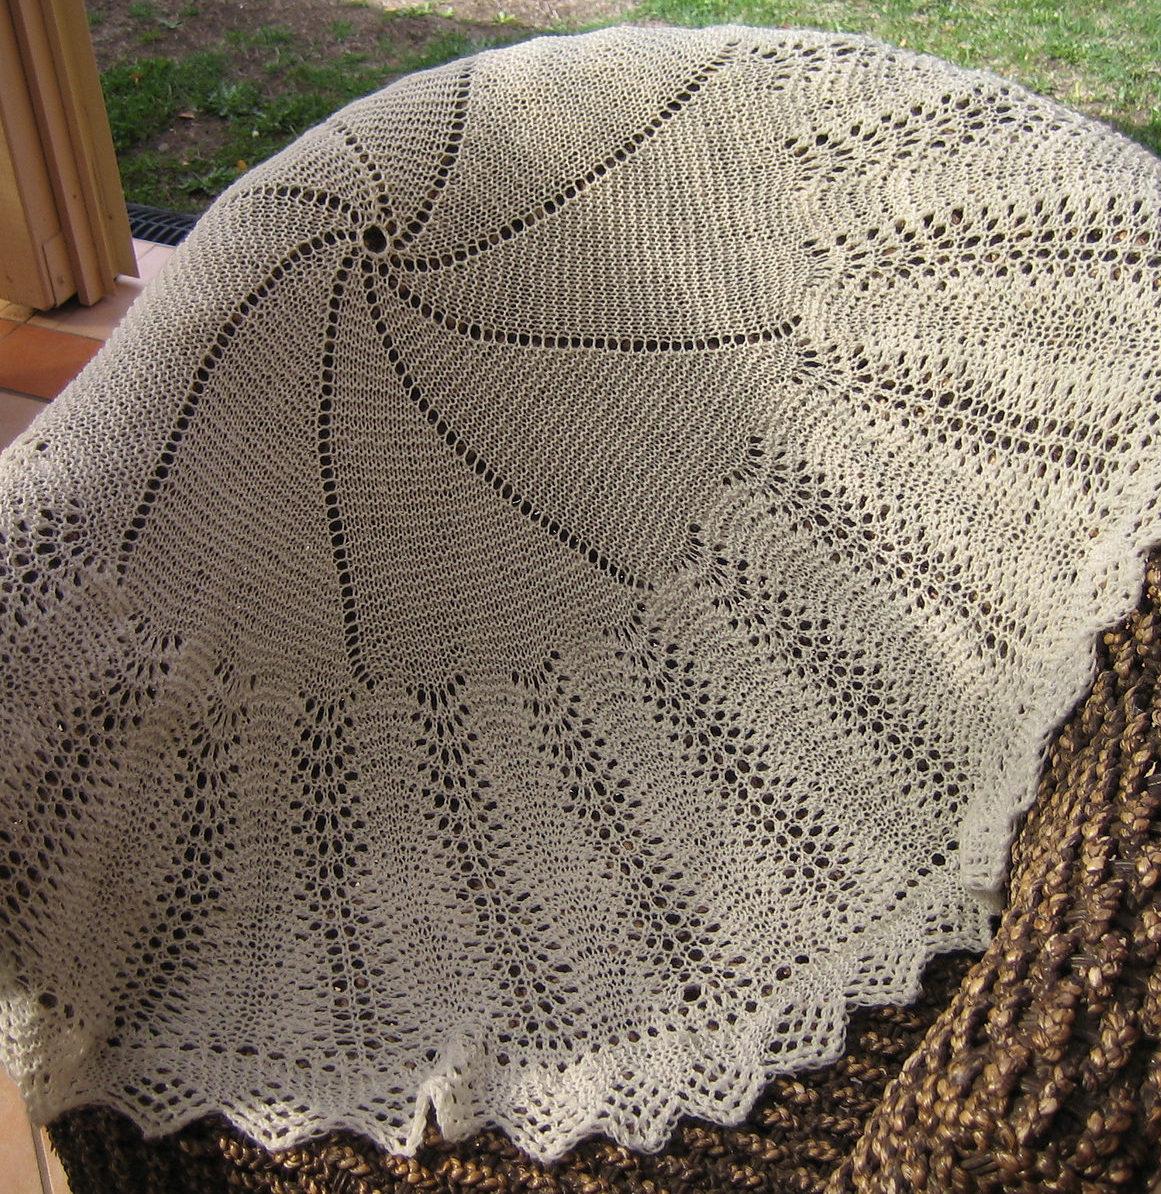 Circular Knitting Patterns Free New Decoration